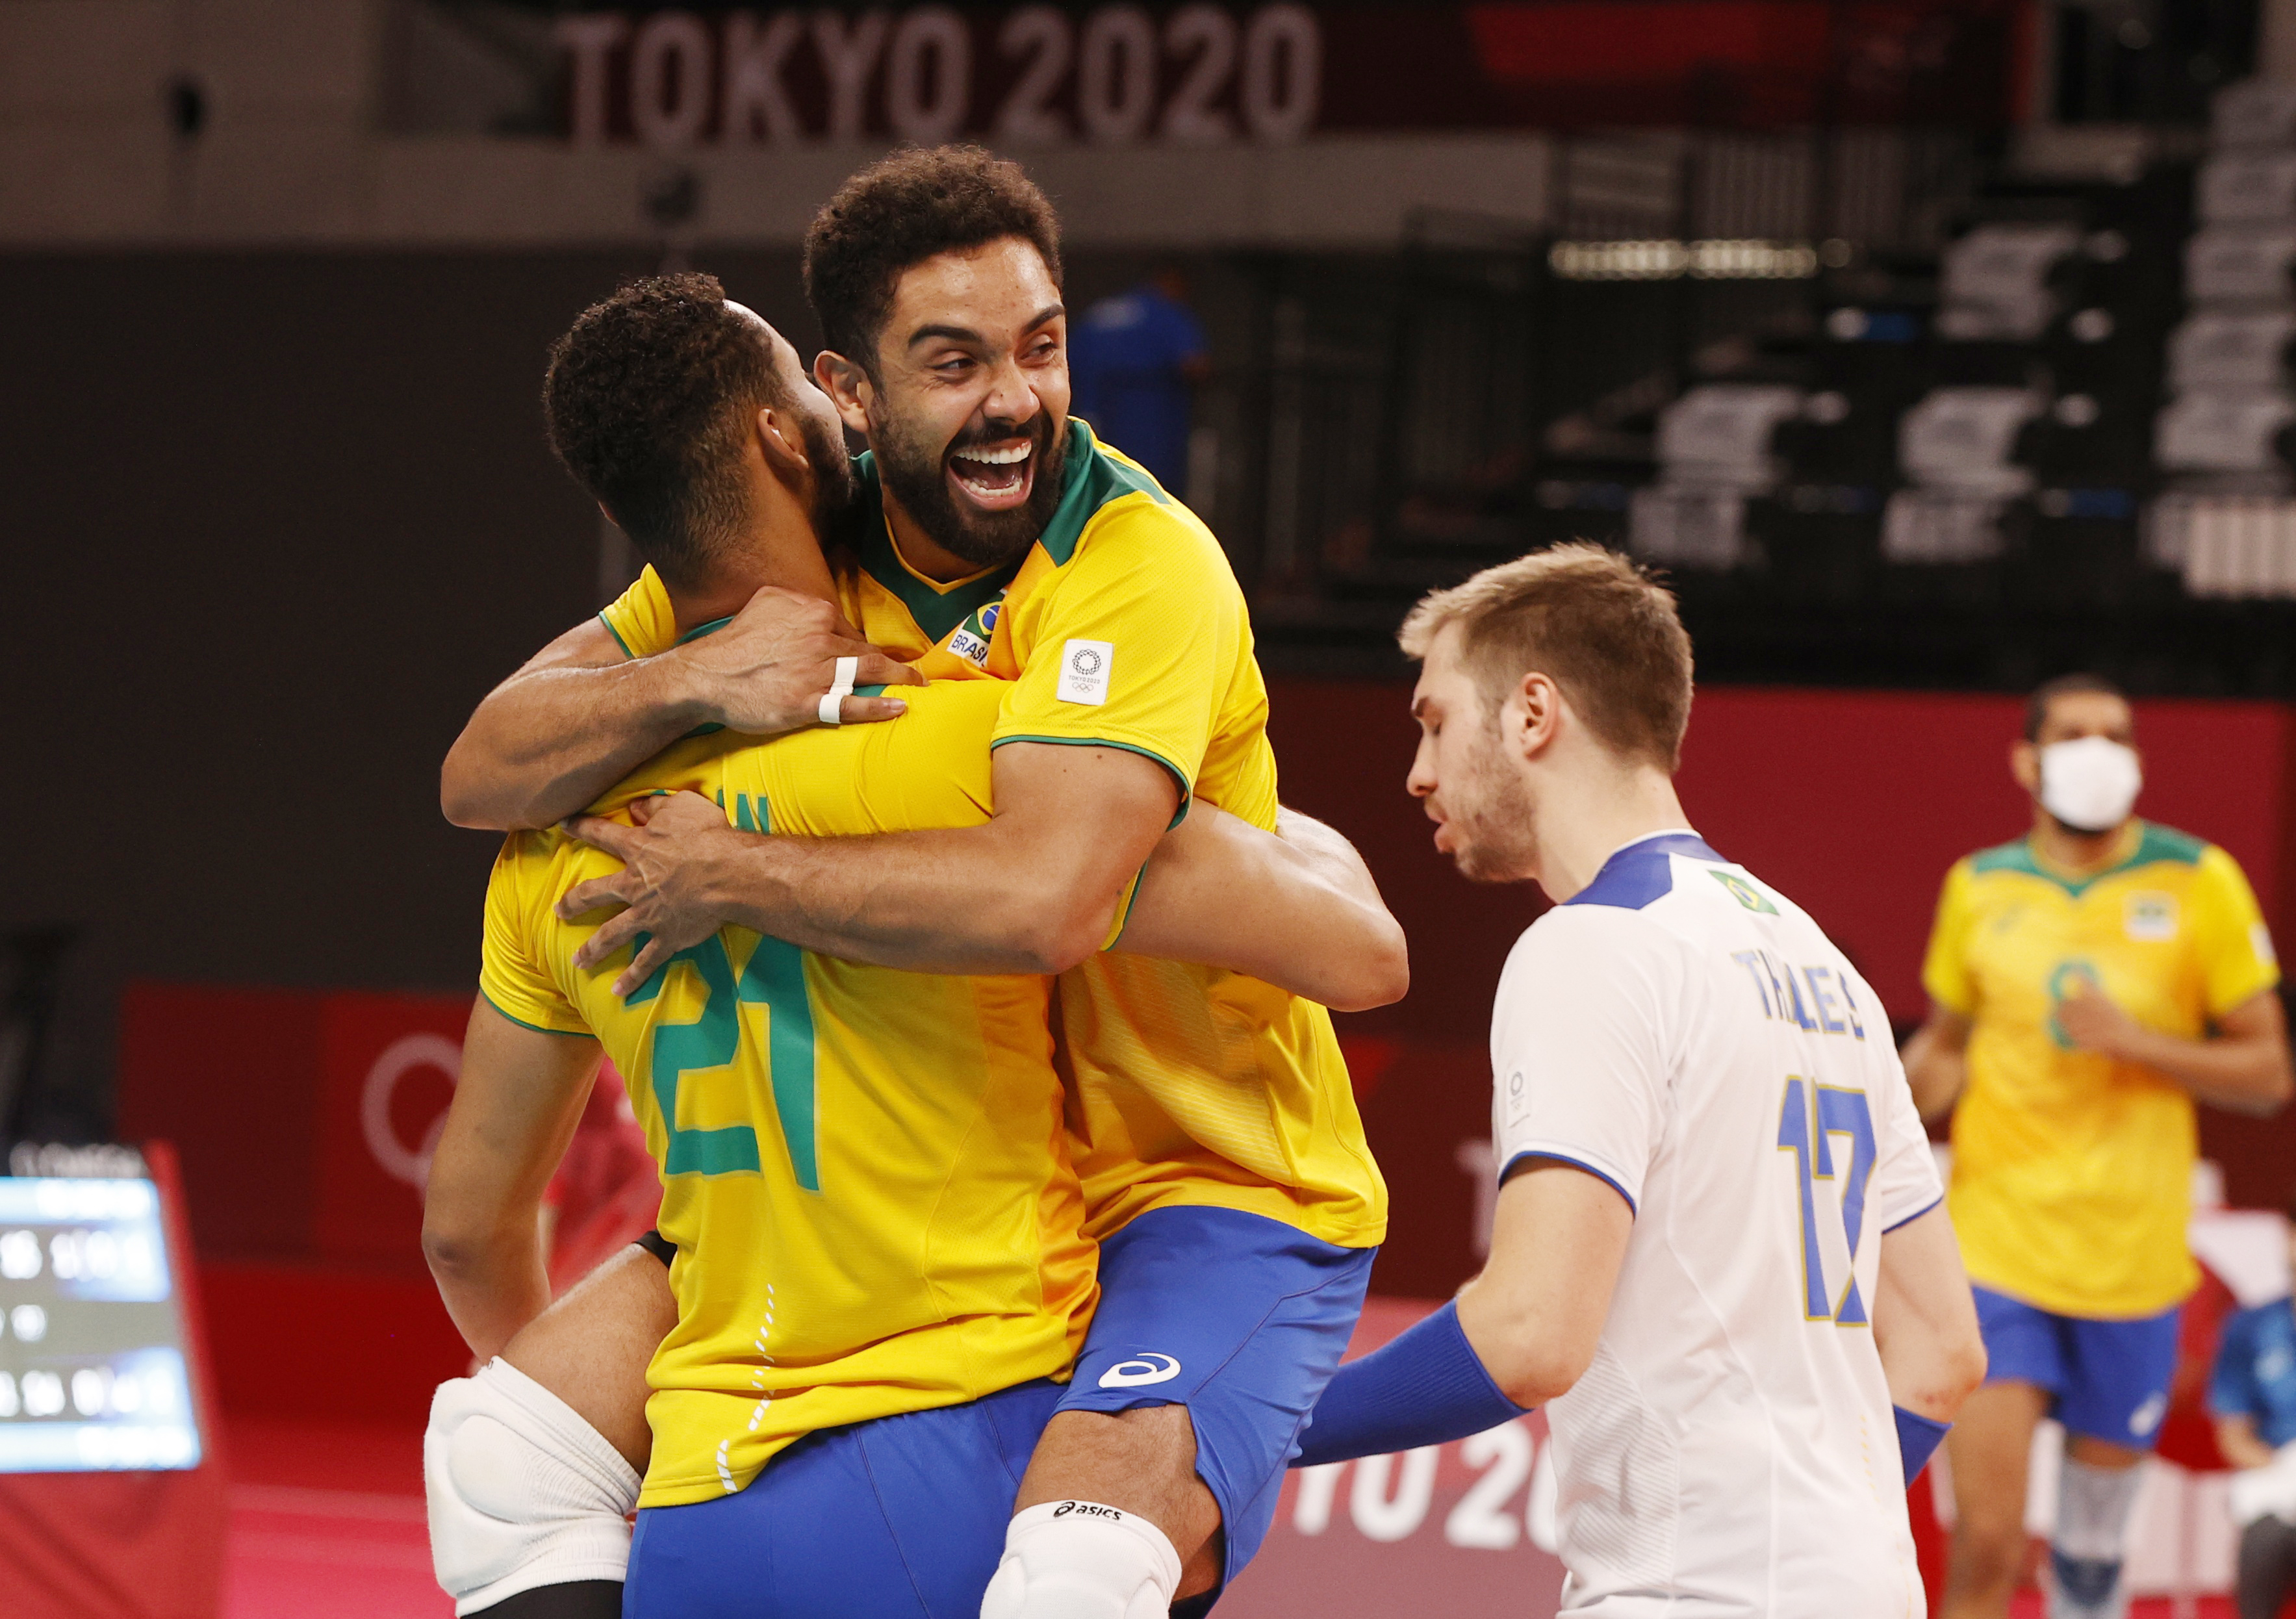 Tokyo 2020 Olympics - Volleyball - Men's Pool B - Brazil v Argentina - Ariake Arena, Tokyo, Japan – July 26, 2021. Fernando of Brazil and Alan of Brazil celebrate. REUTERS/Valentyn Ogirenko